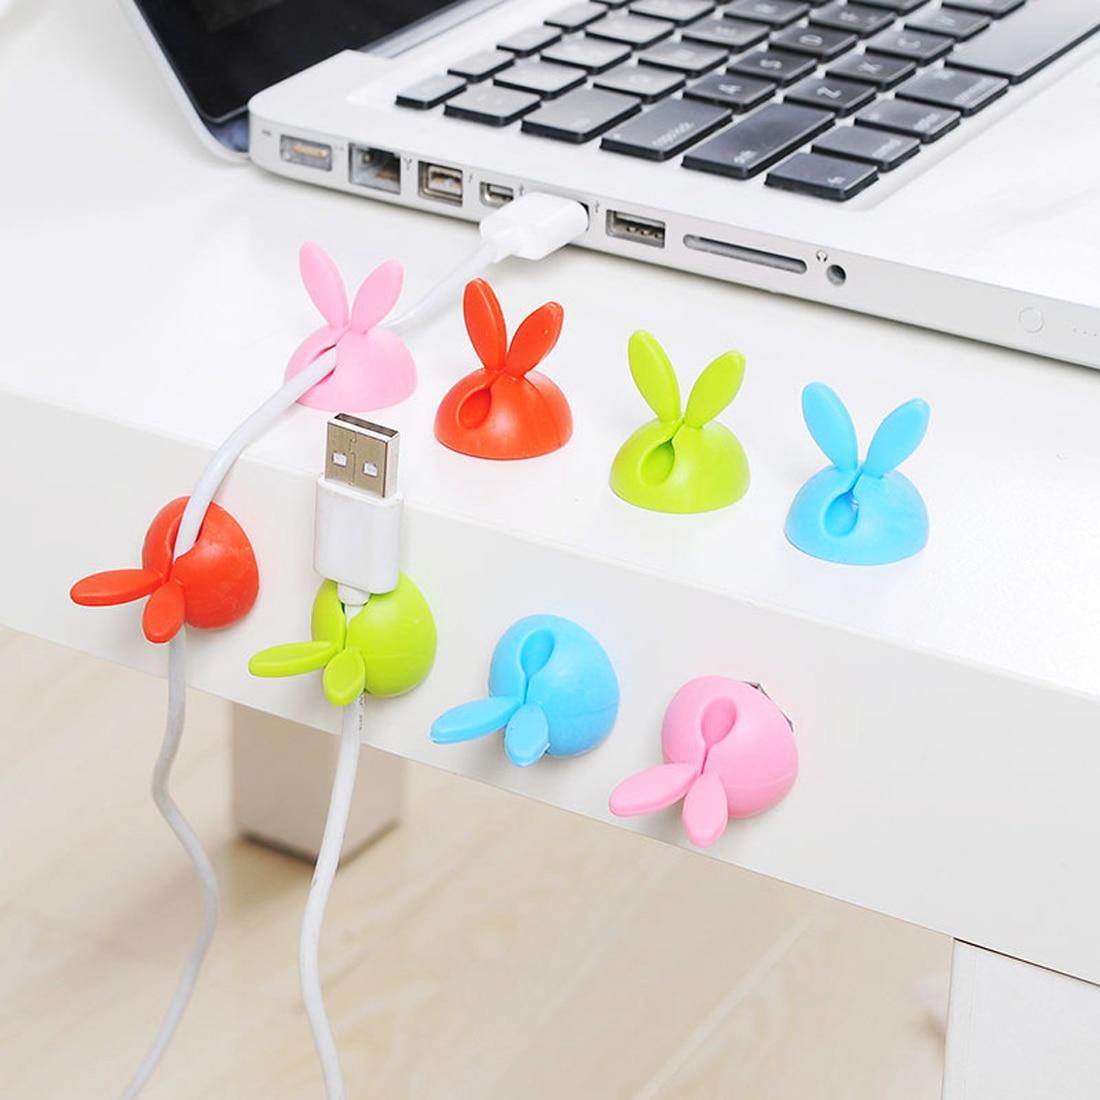 Cable-Organizer Headphone Computer Bobbin Wires-Holder Desktop-Winder 4pcs Rabbit Great